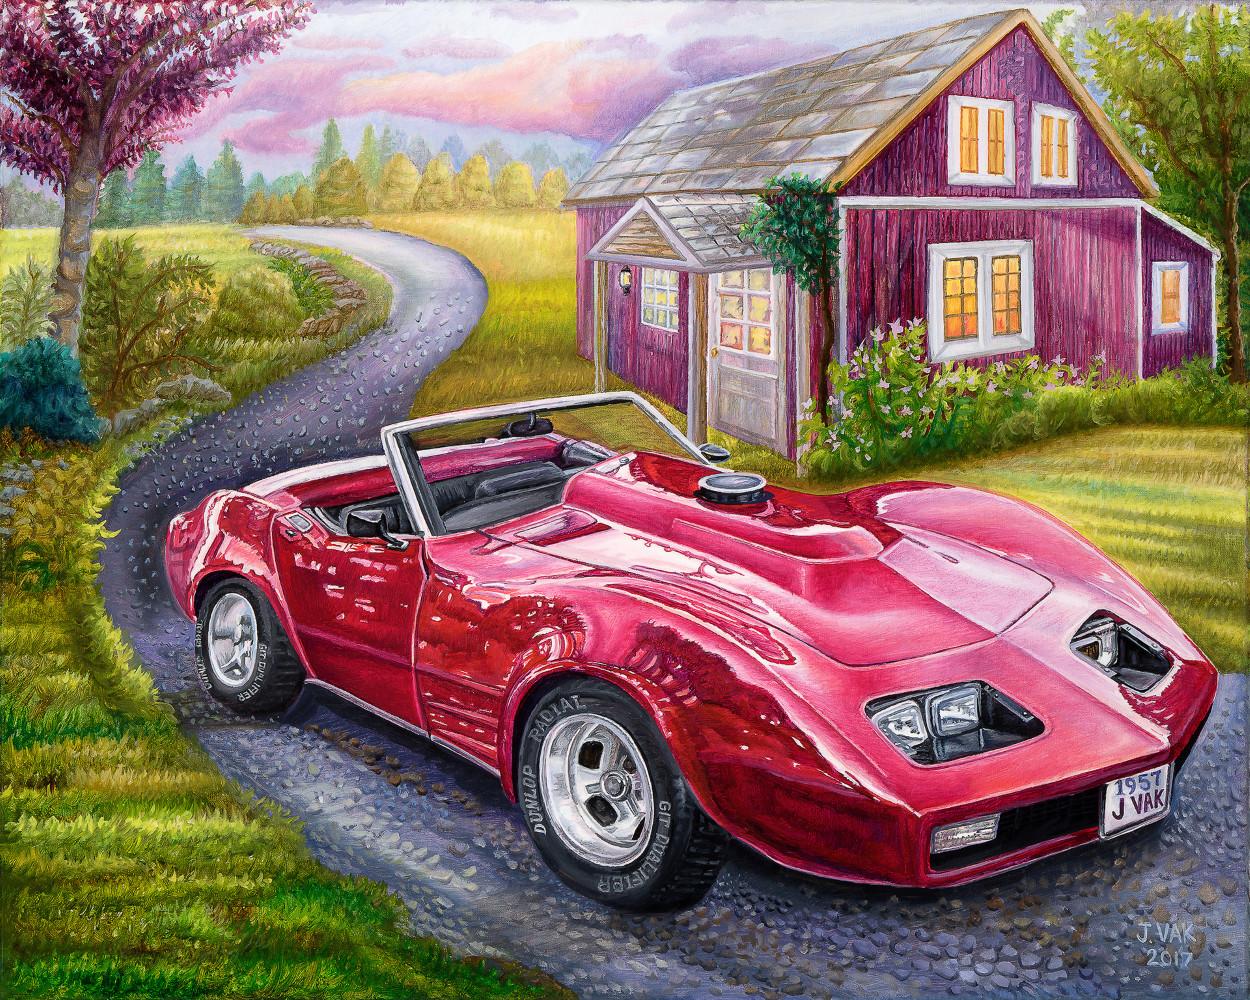 1973 Pontiac Firebird 24 X 30 Oil on Canvas          $3500           2017